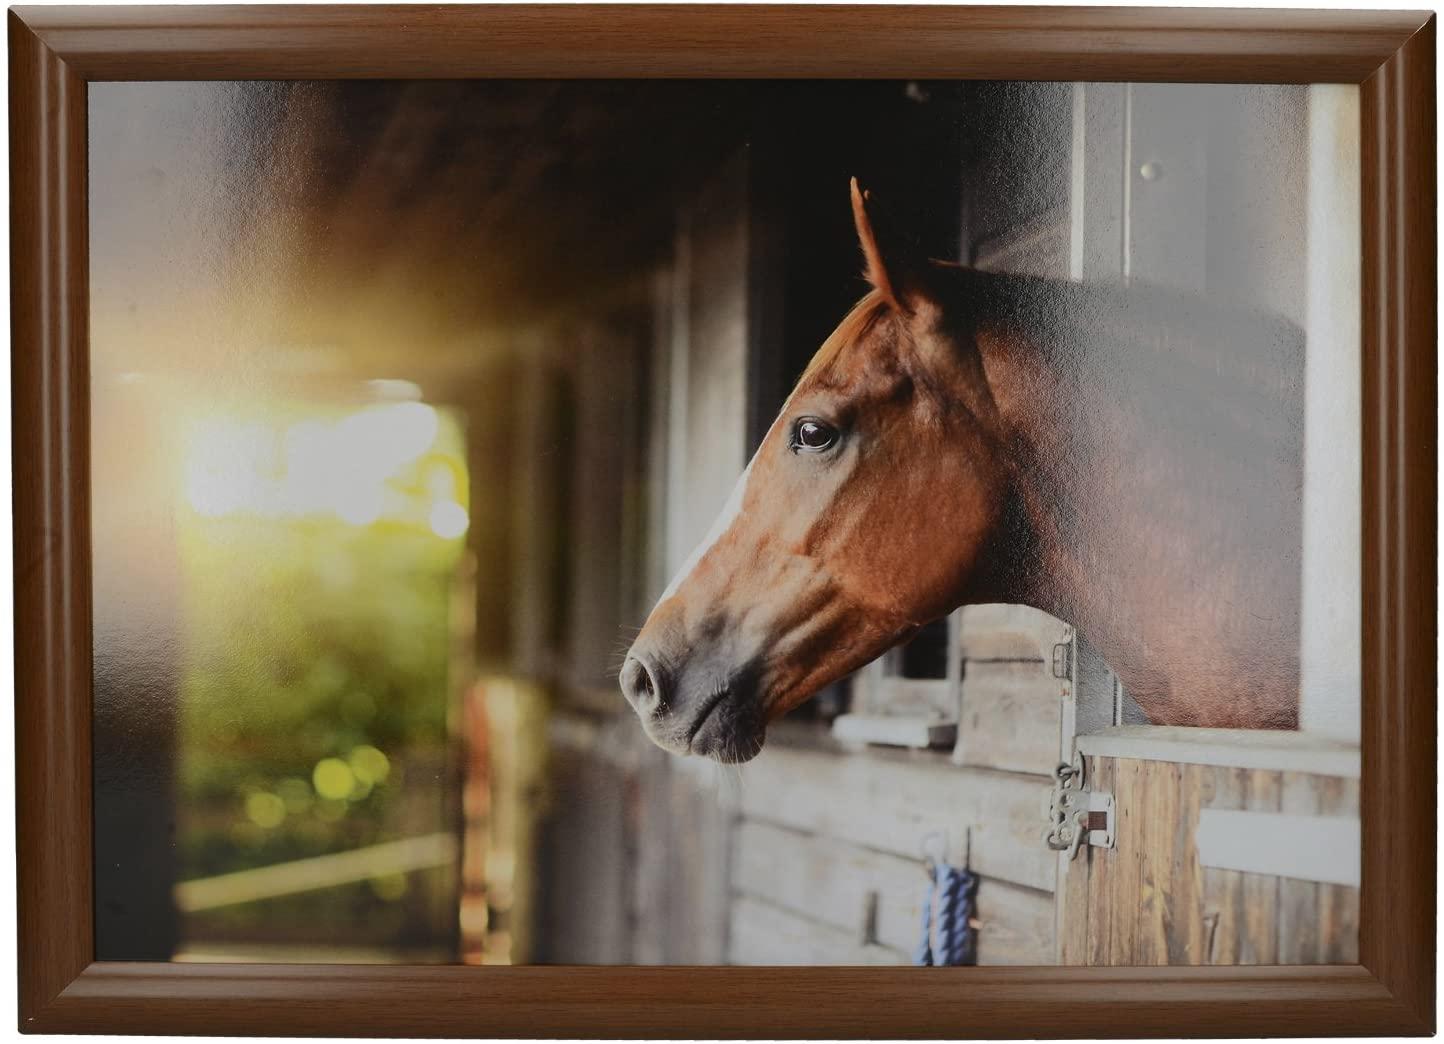 CreativeTops 'Stable Horse' Cushioned Bean Bag Lap Tray, 44 x 34 cm (17.5